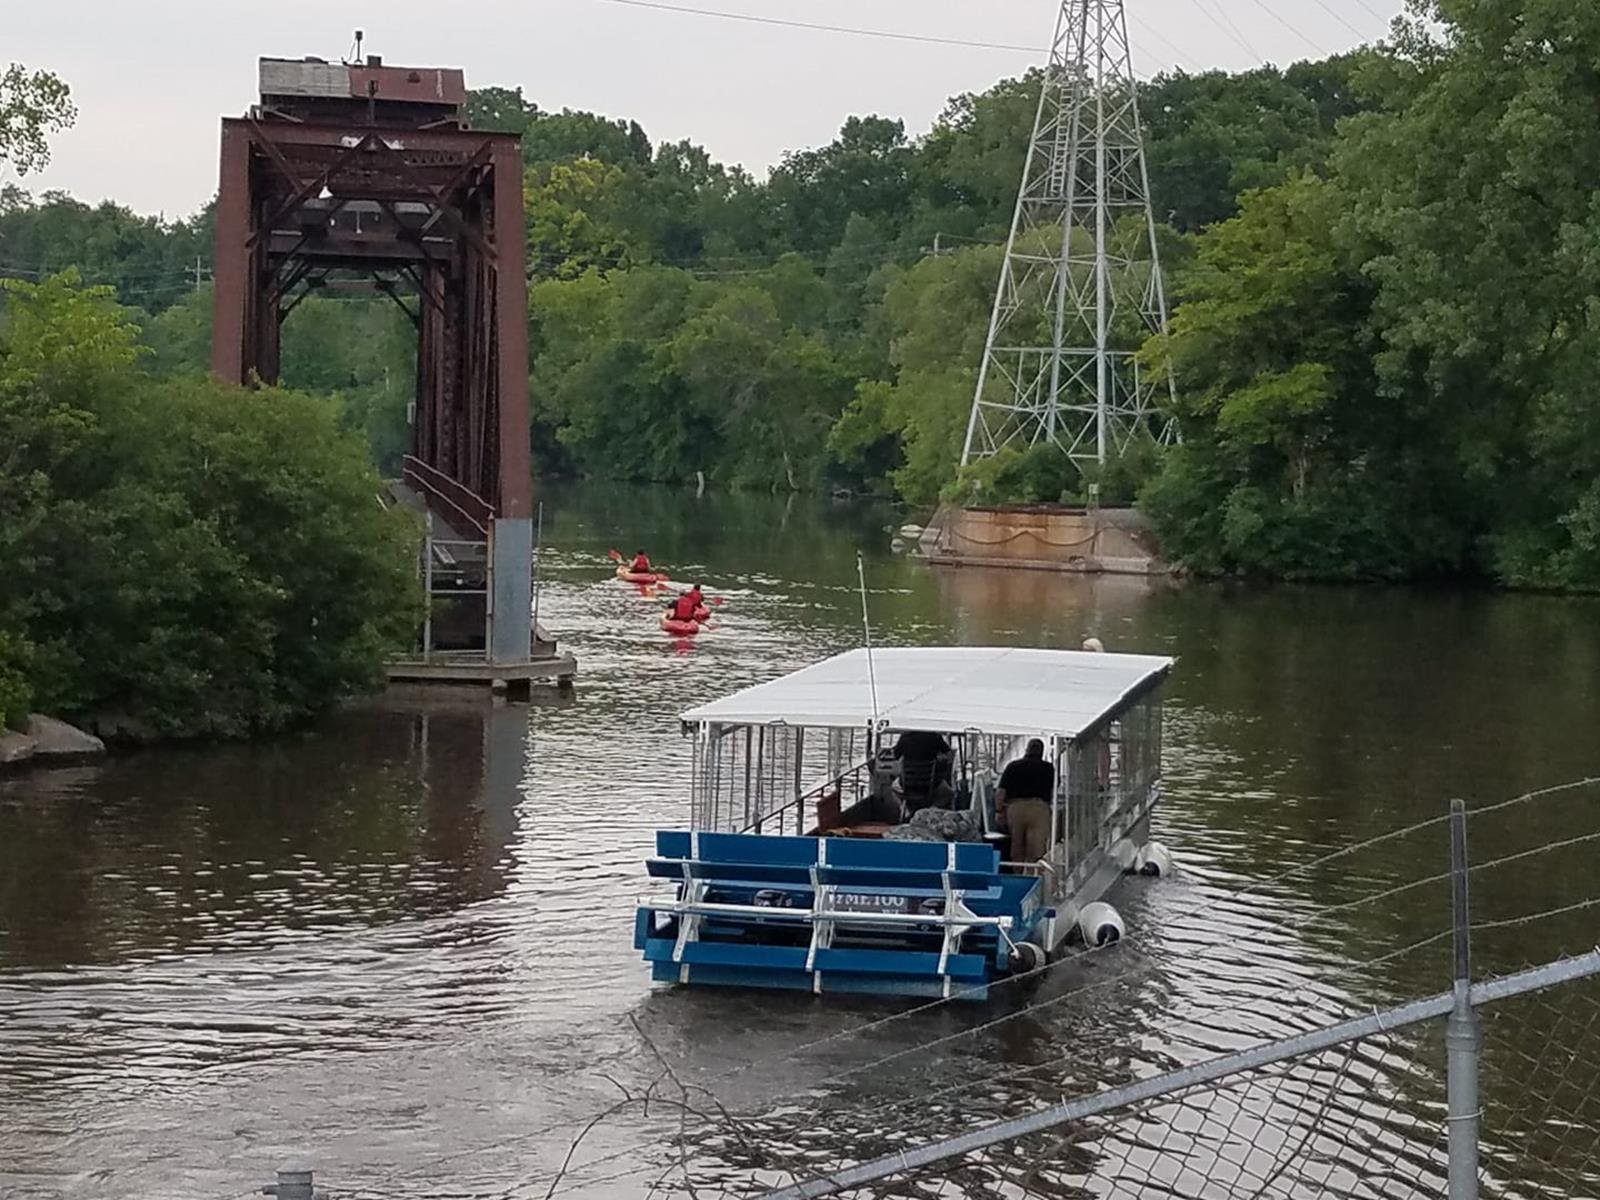 RTT with kayaks by Rr bridge